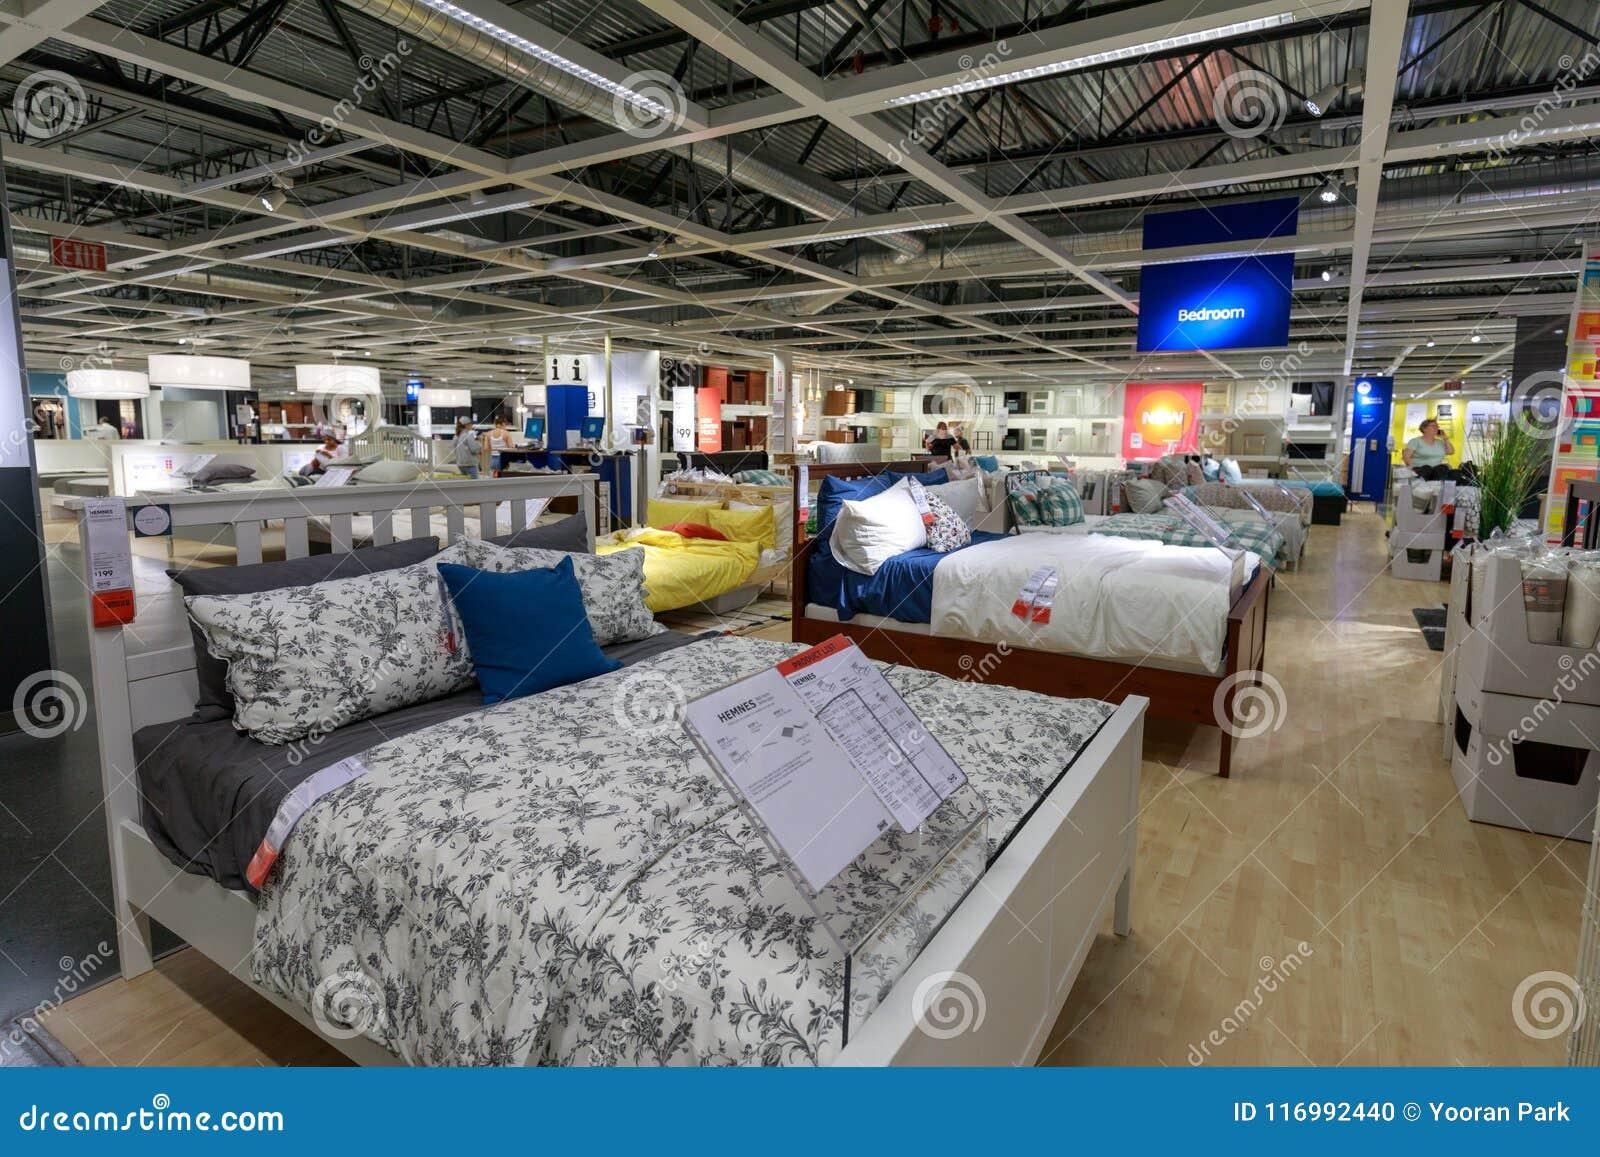 Interior Of The Ikea Store In Portland Oregon Ikea Is The World S